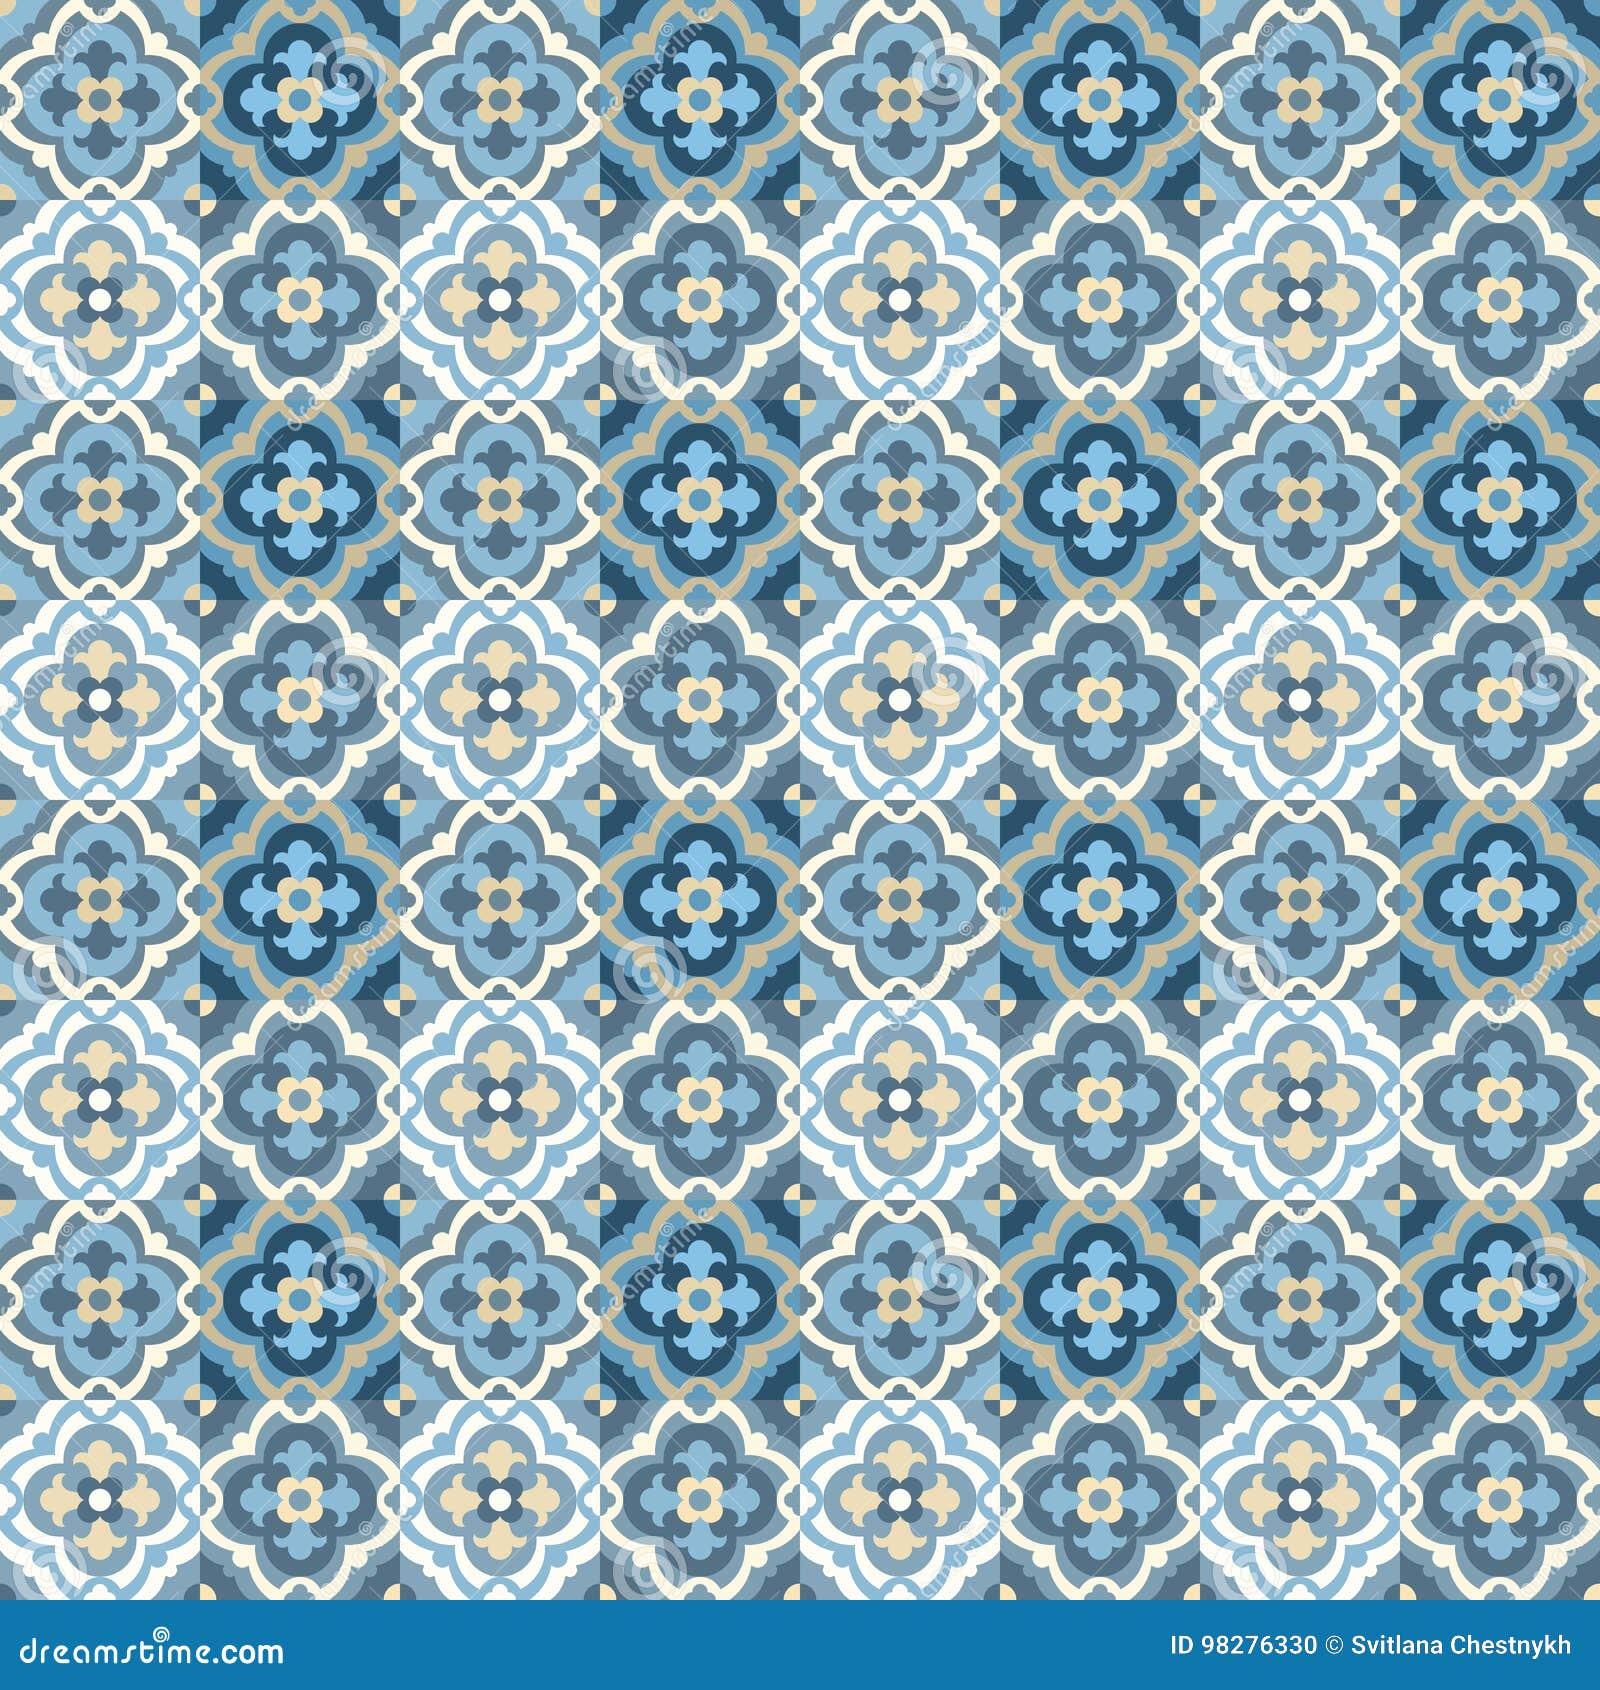 Retro Floor Tiles pattern stock vector. Illustration of moroccan ...